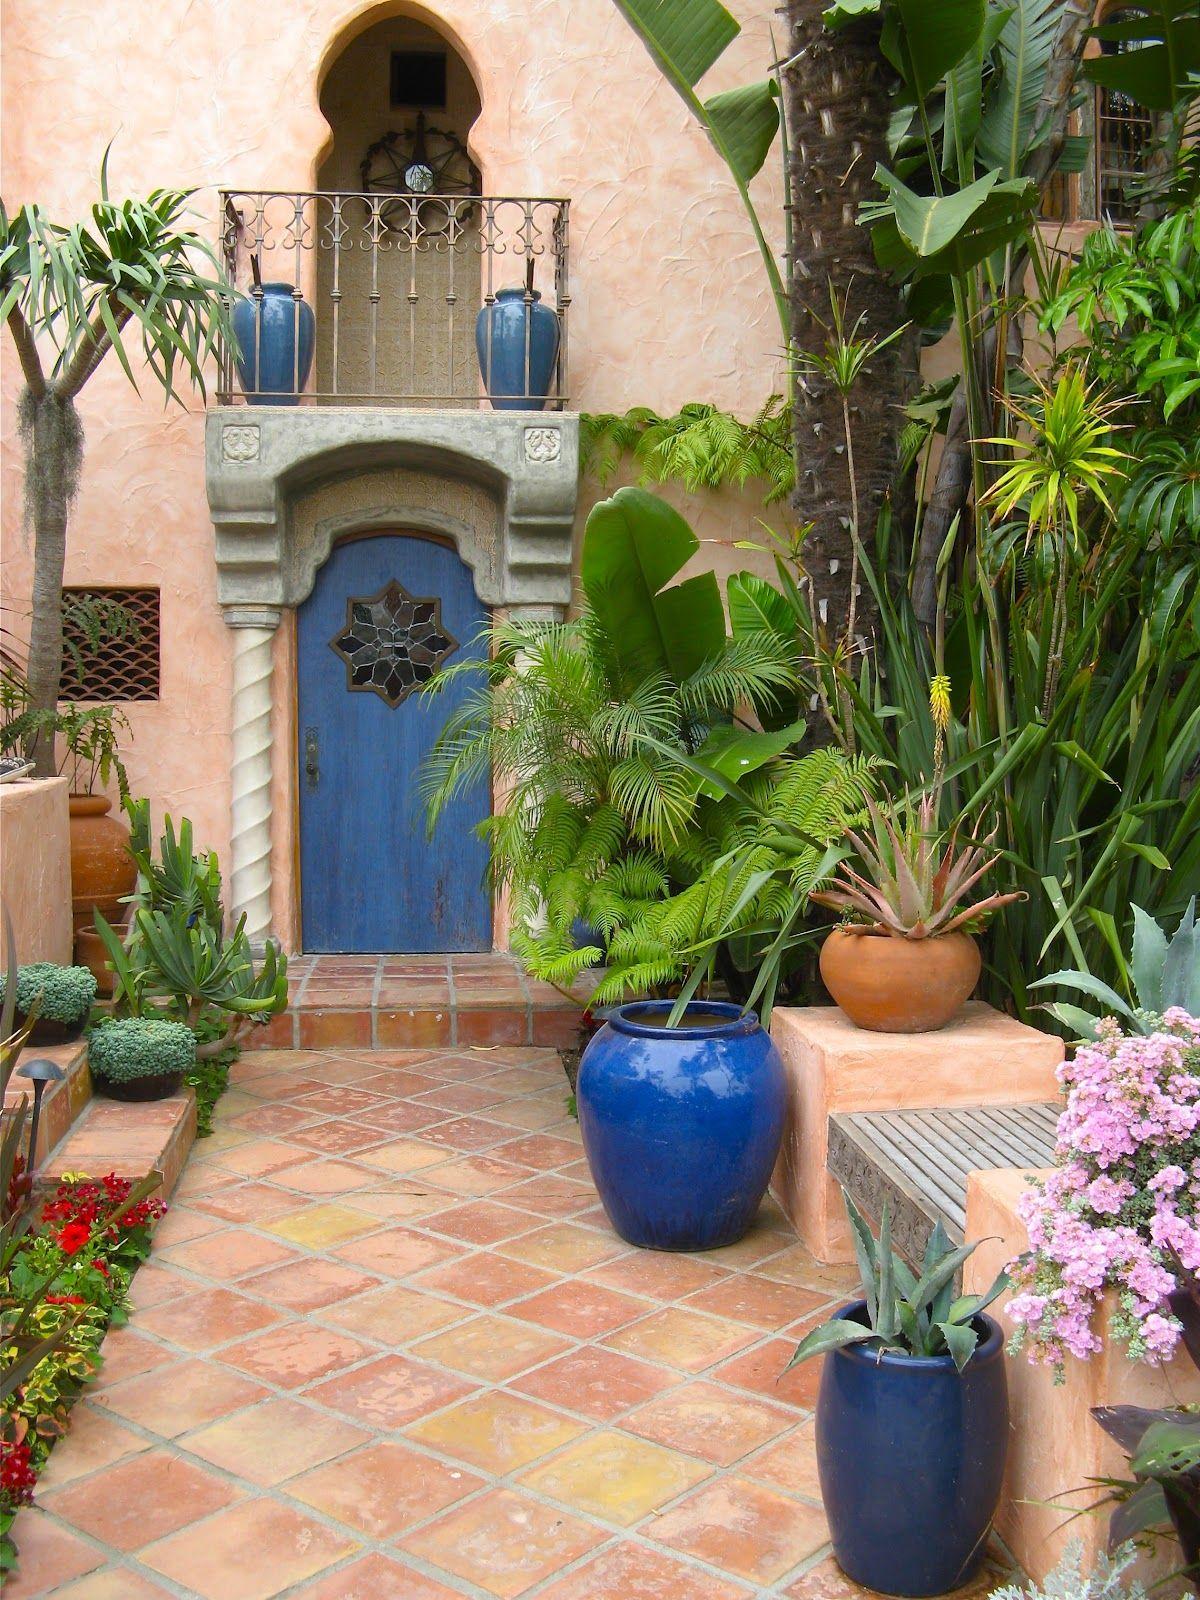 Moroccan garden ar bia pinterest gardens front for French courtyard garden ideas